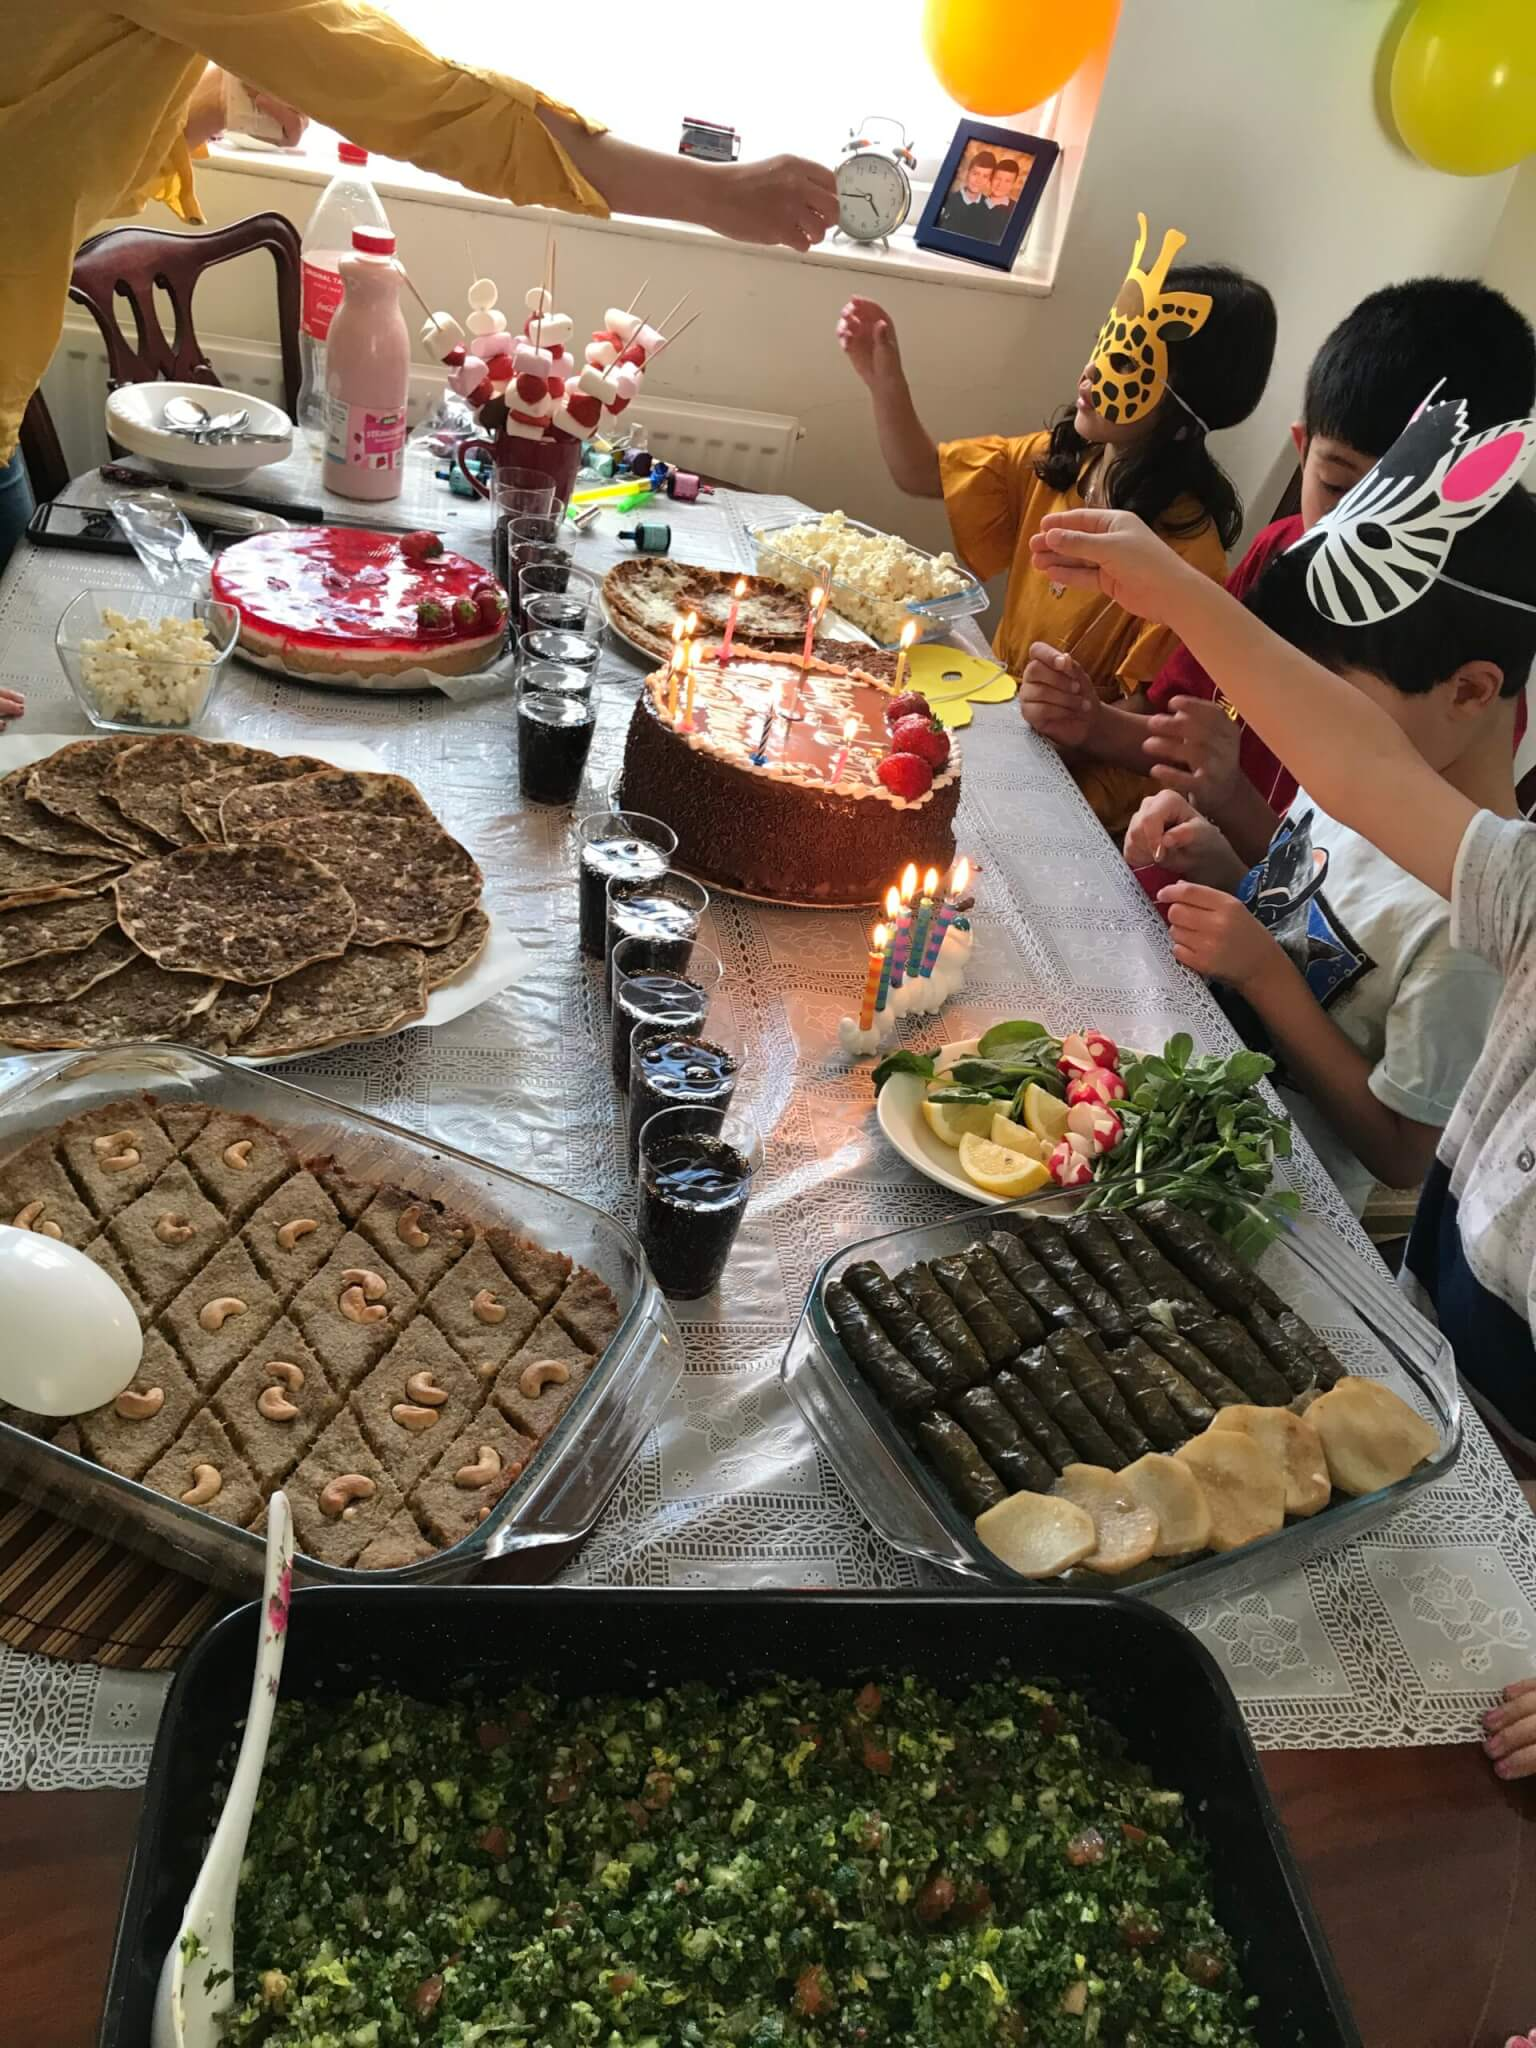 Syrian birthday party